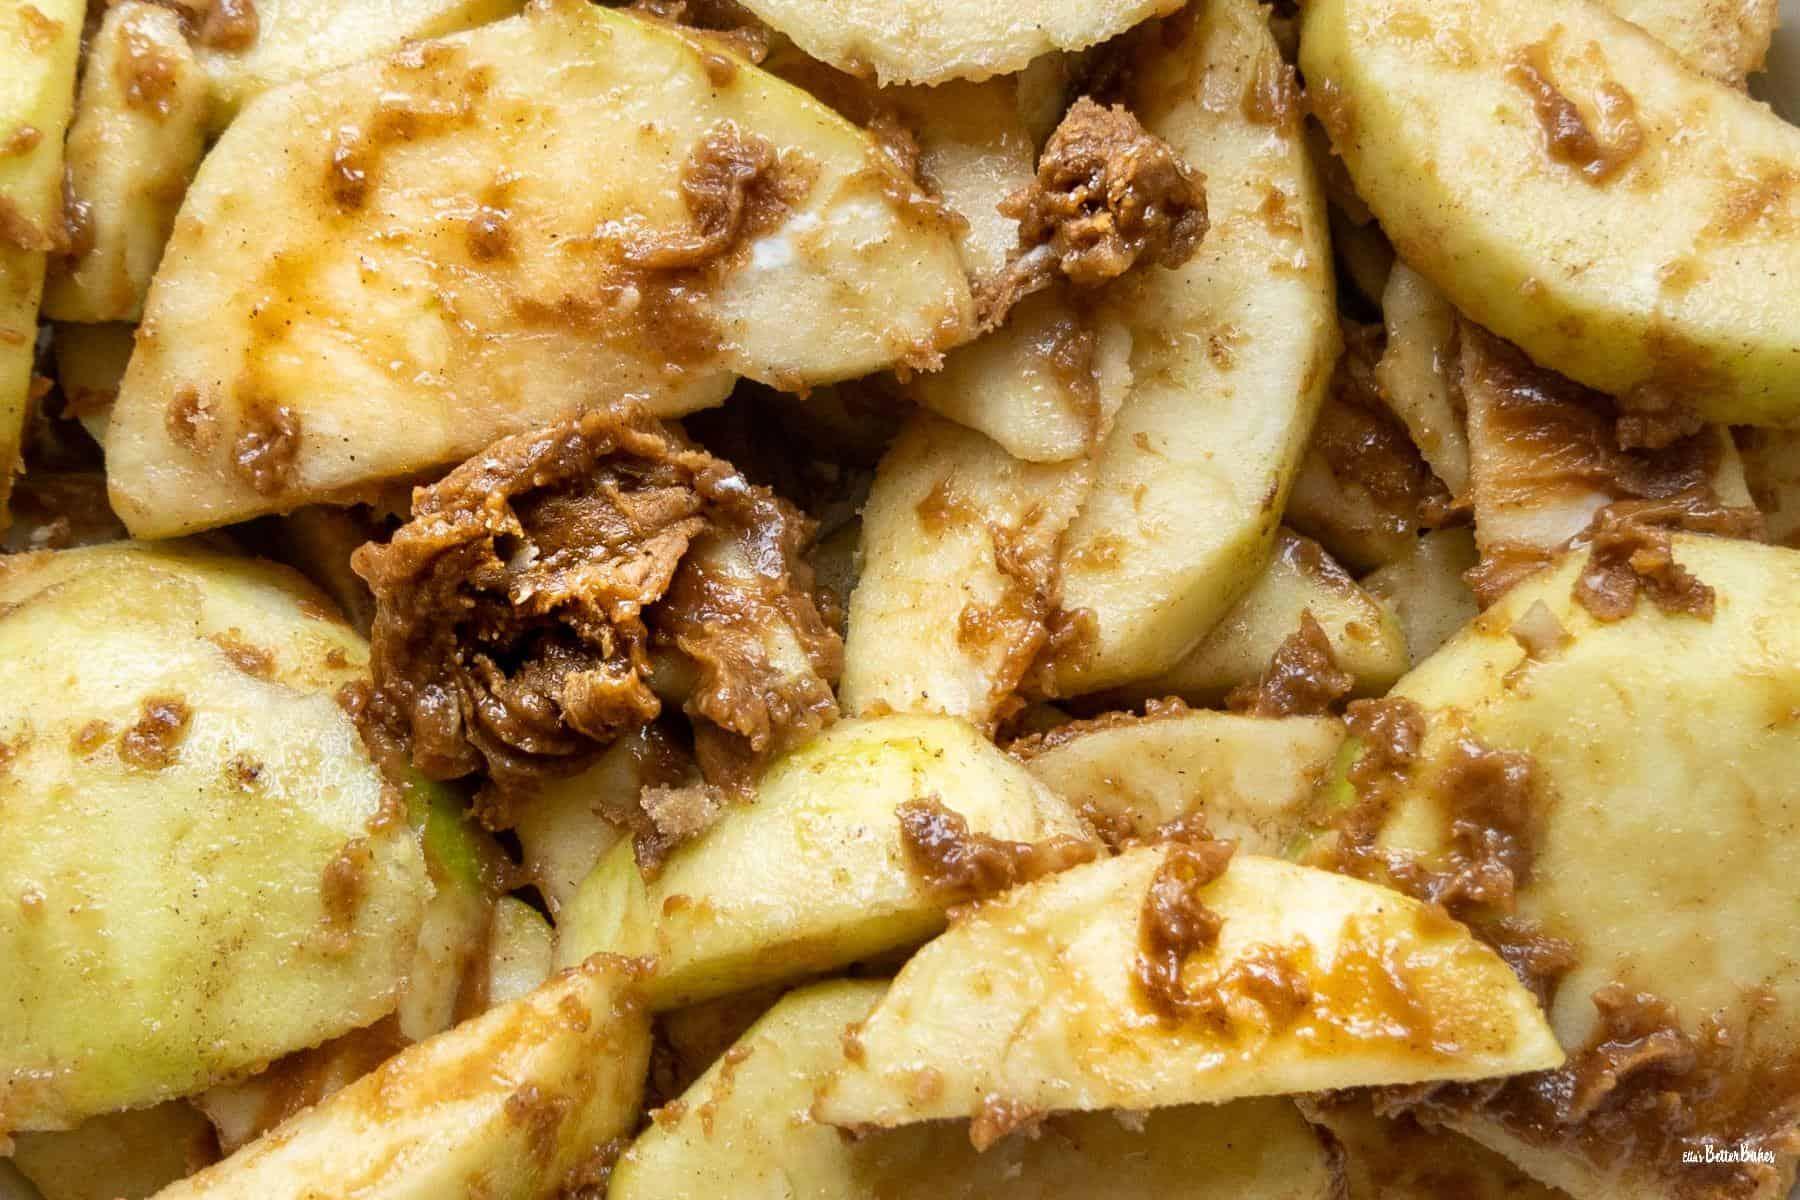 prepared apples close up